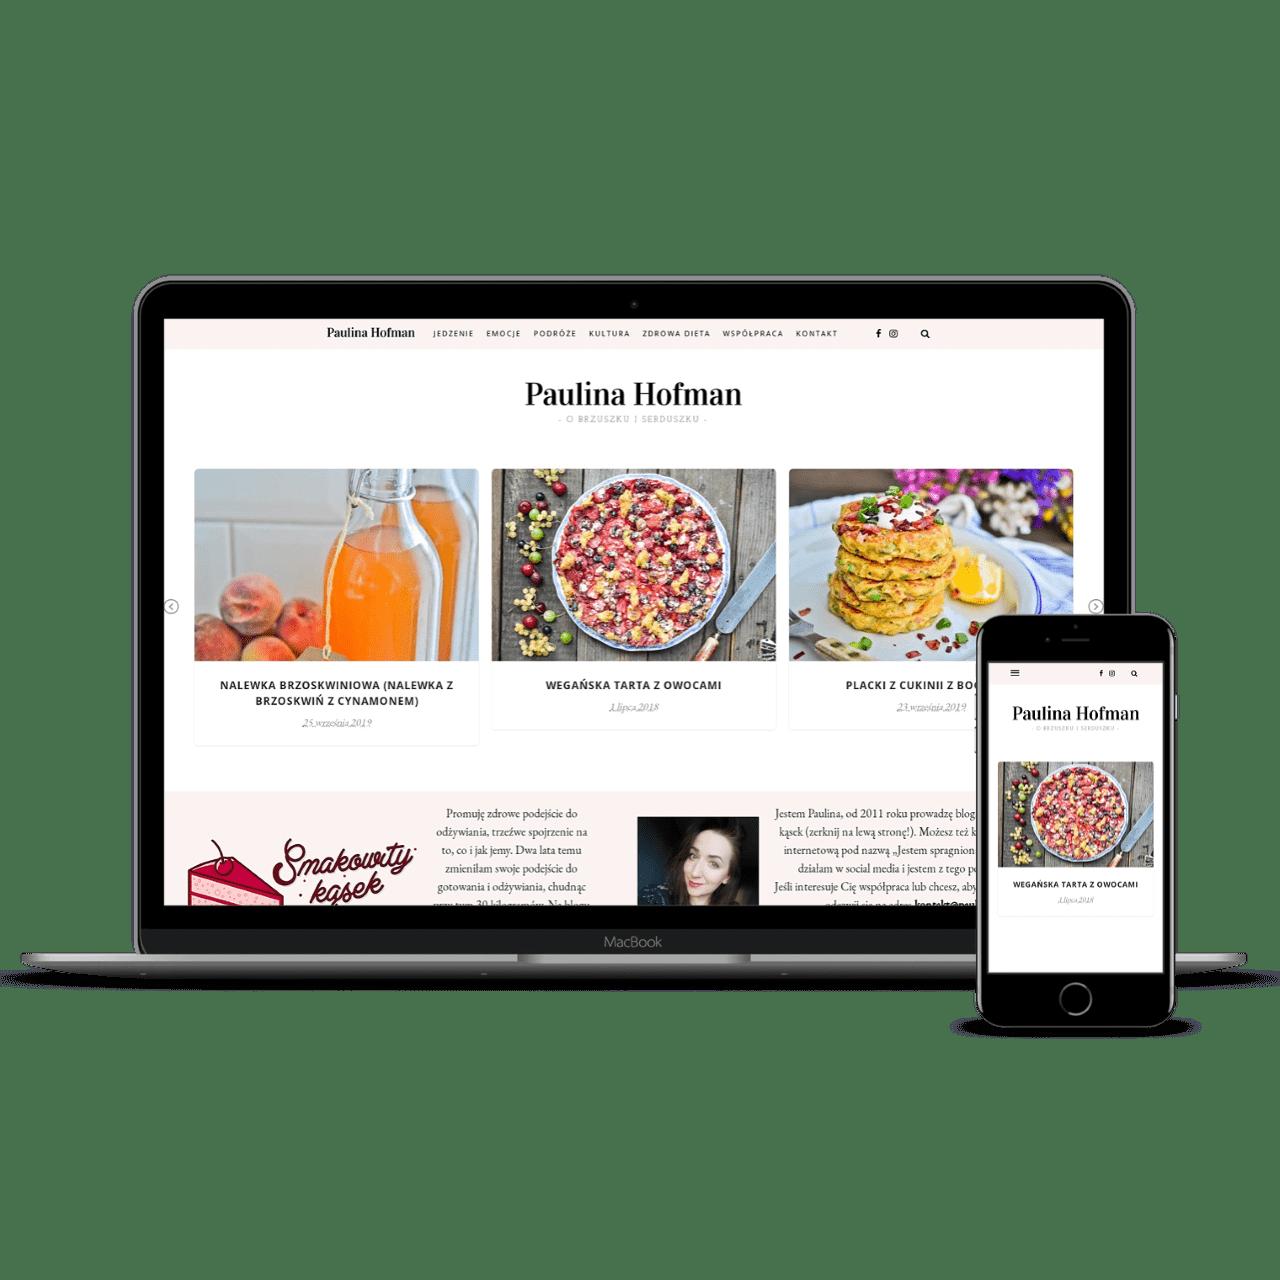 PaulinaHofman website